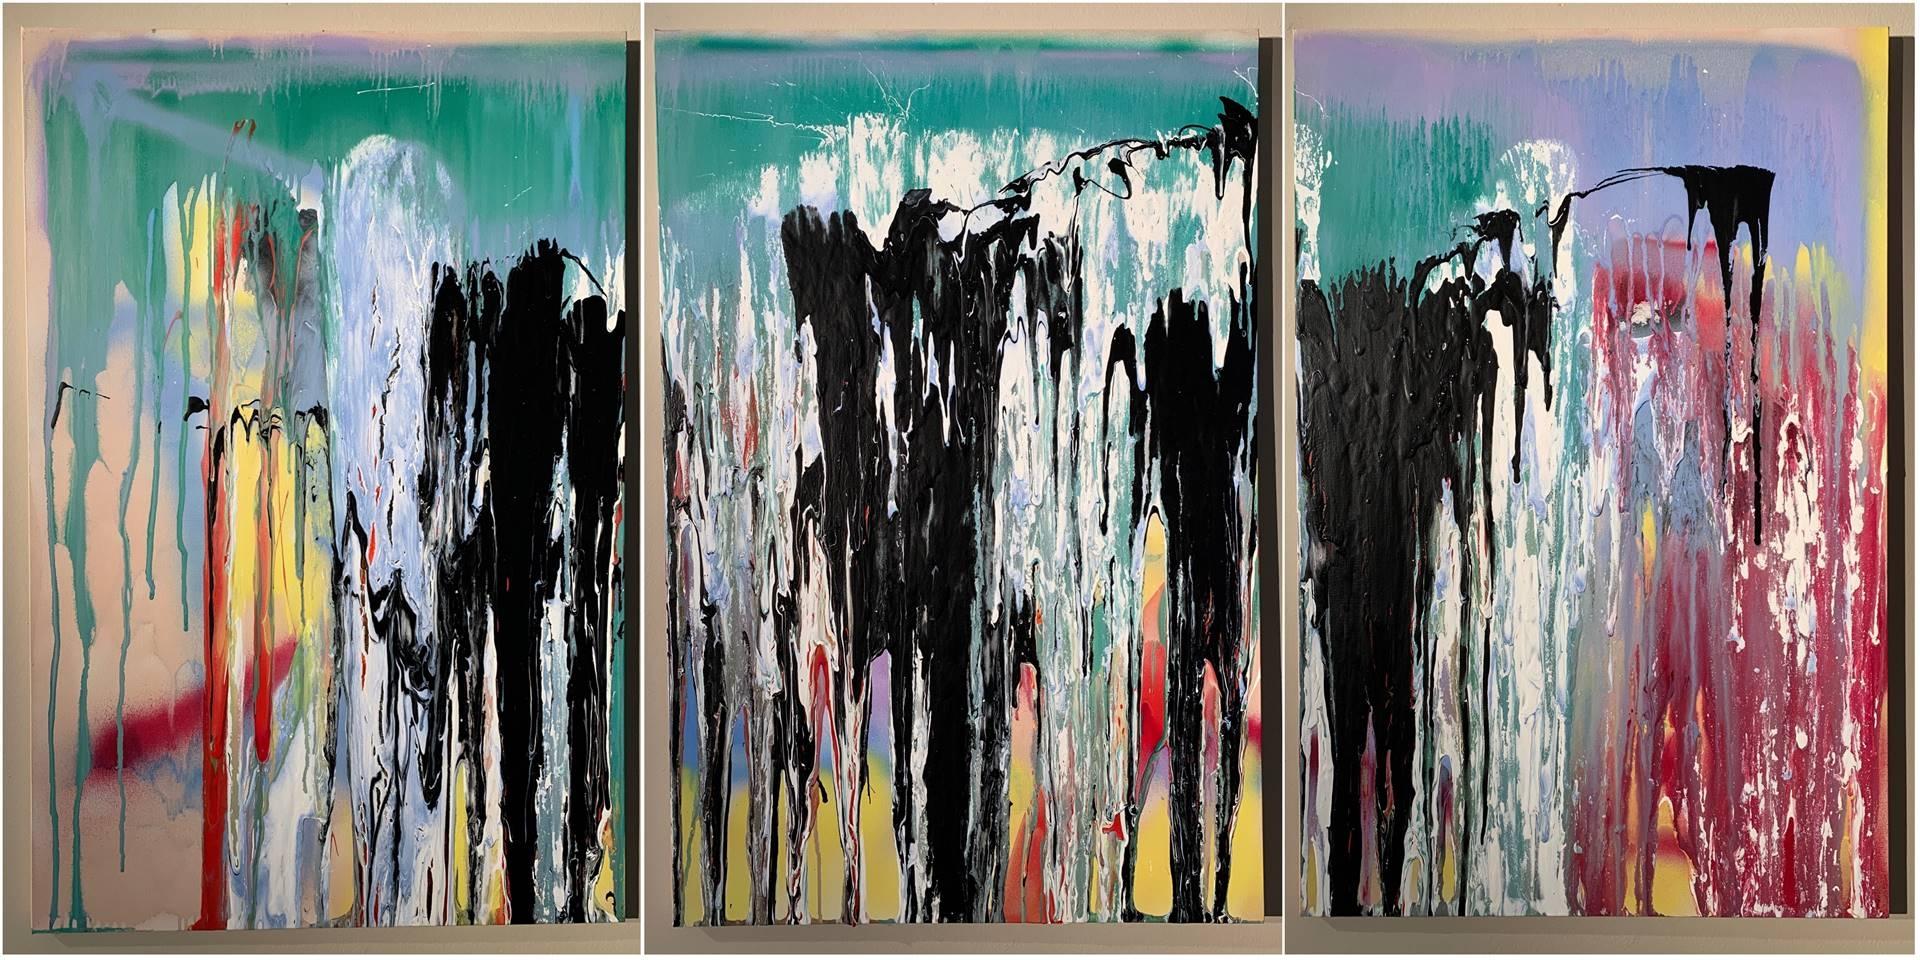 Tyler Santangelo, More Joy, Acrylic & Spraypaint on Canvas, 36 x 72 image